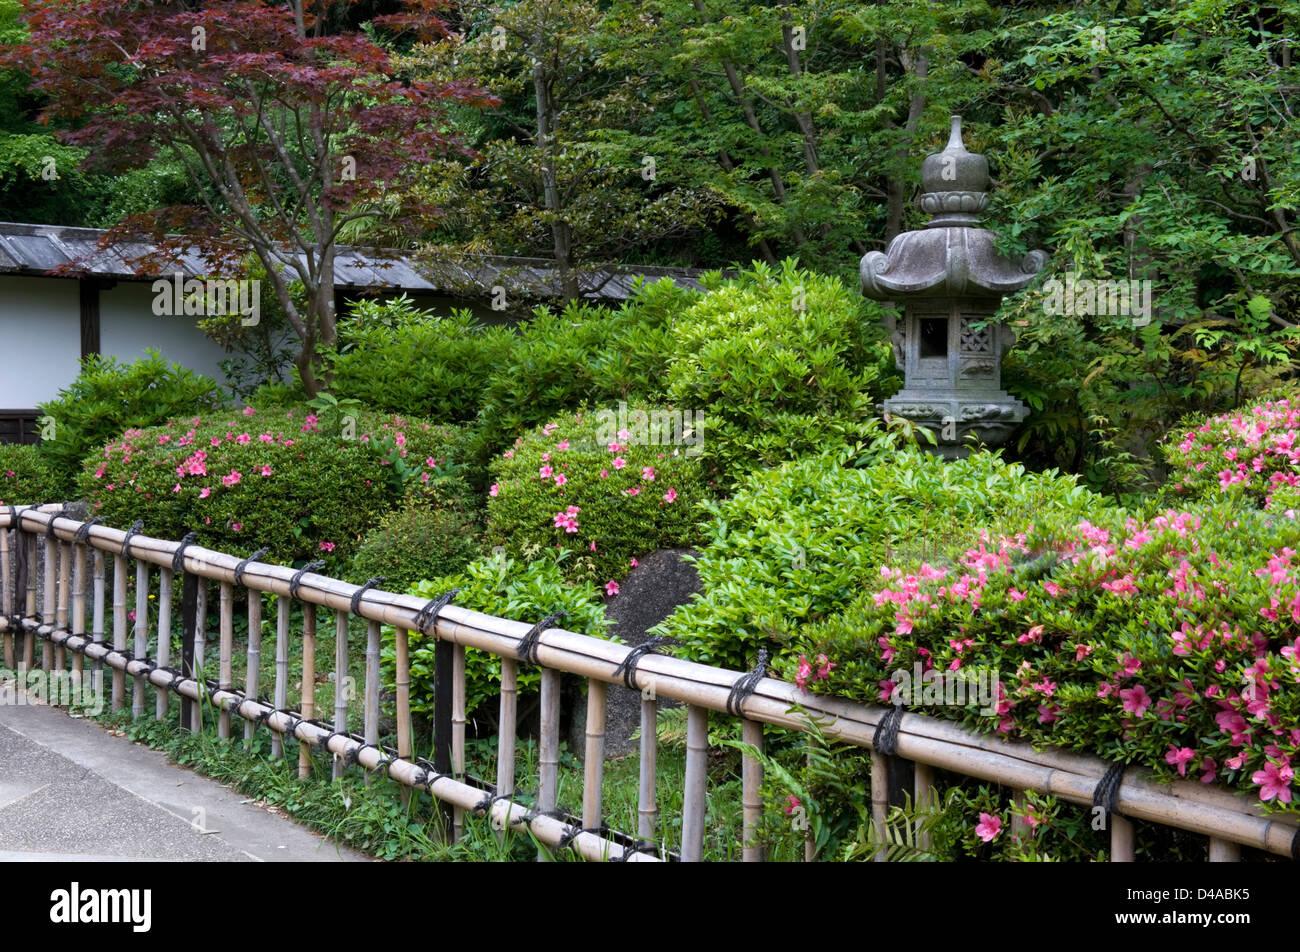 Stone Lantern And Bamboo Fence With Azalea Bushes In ...